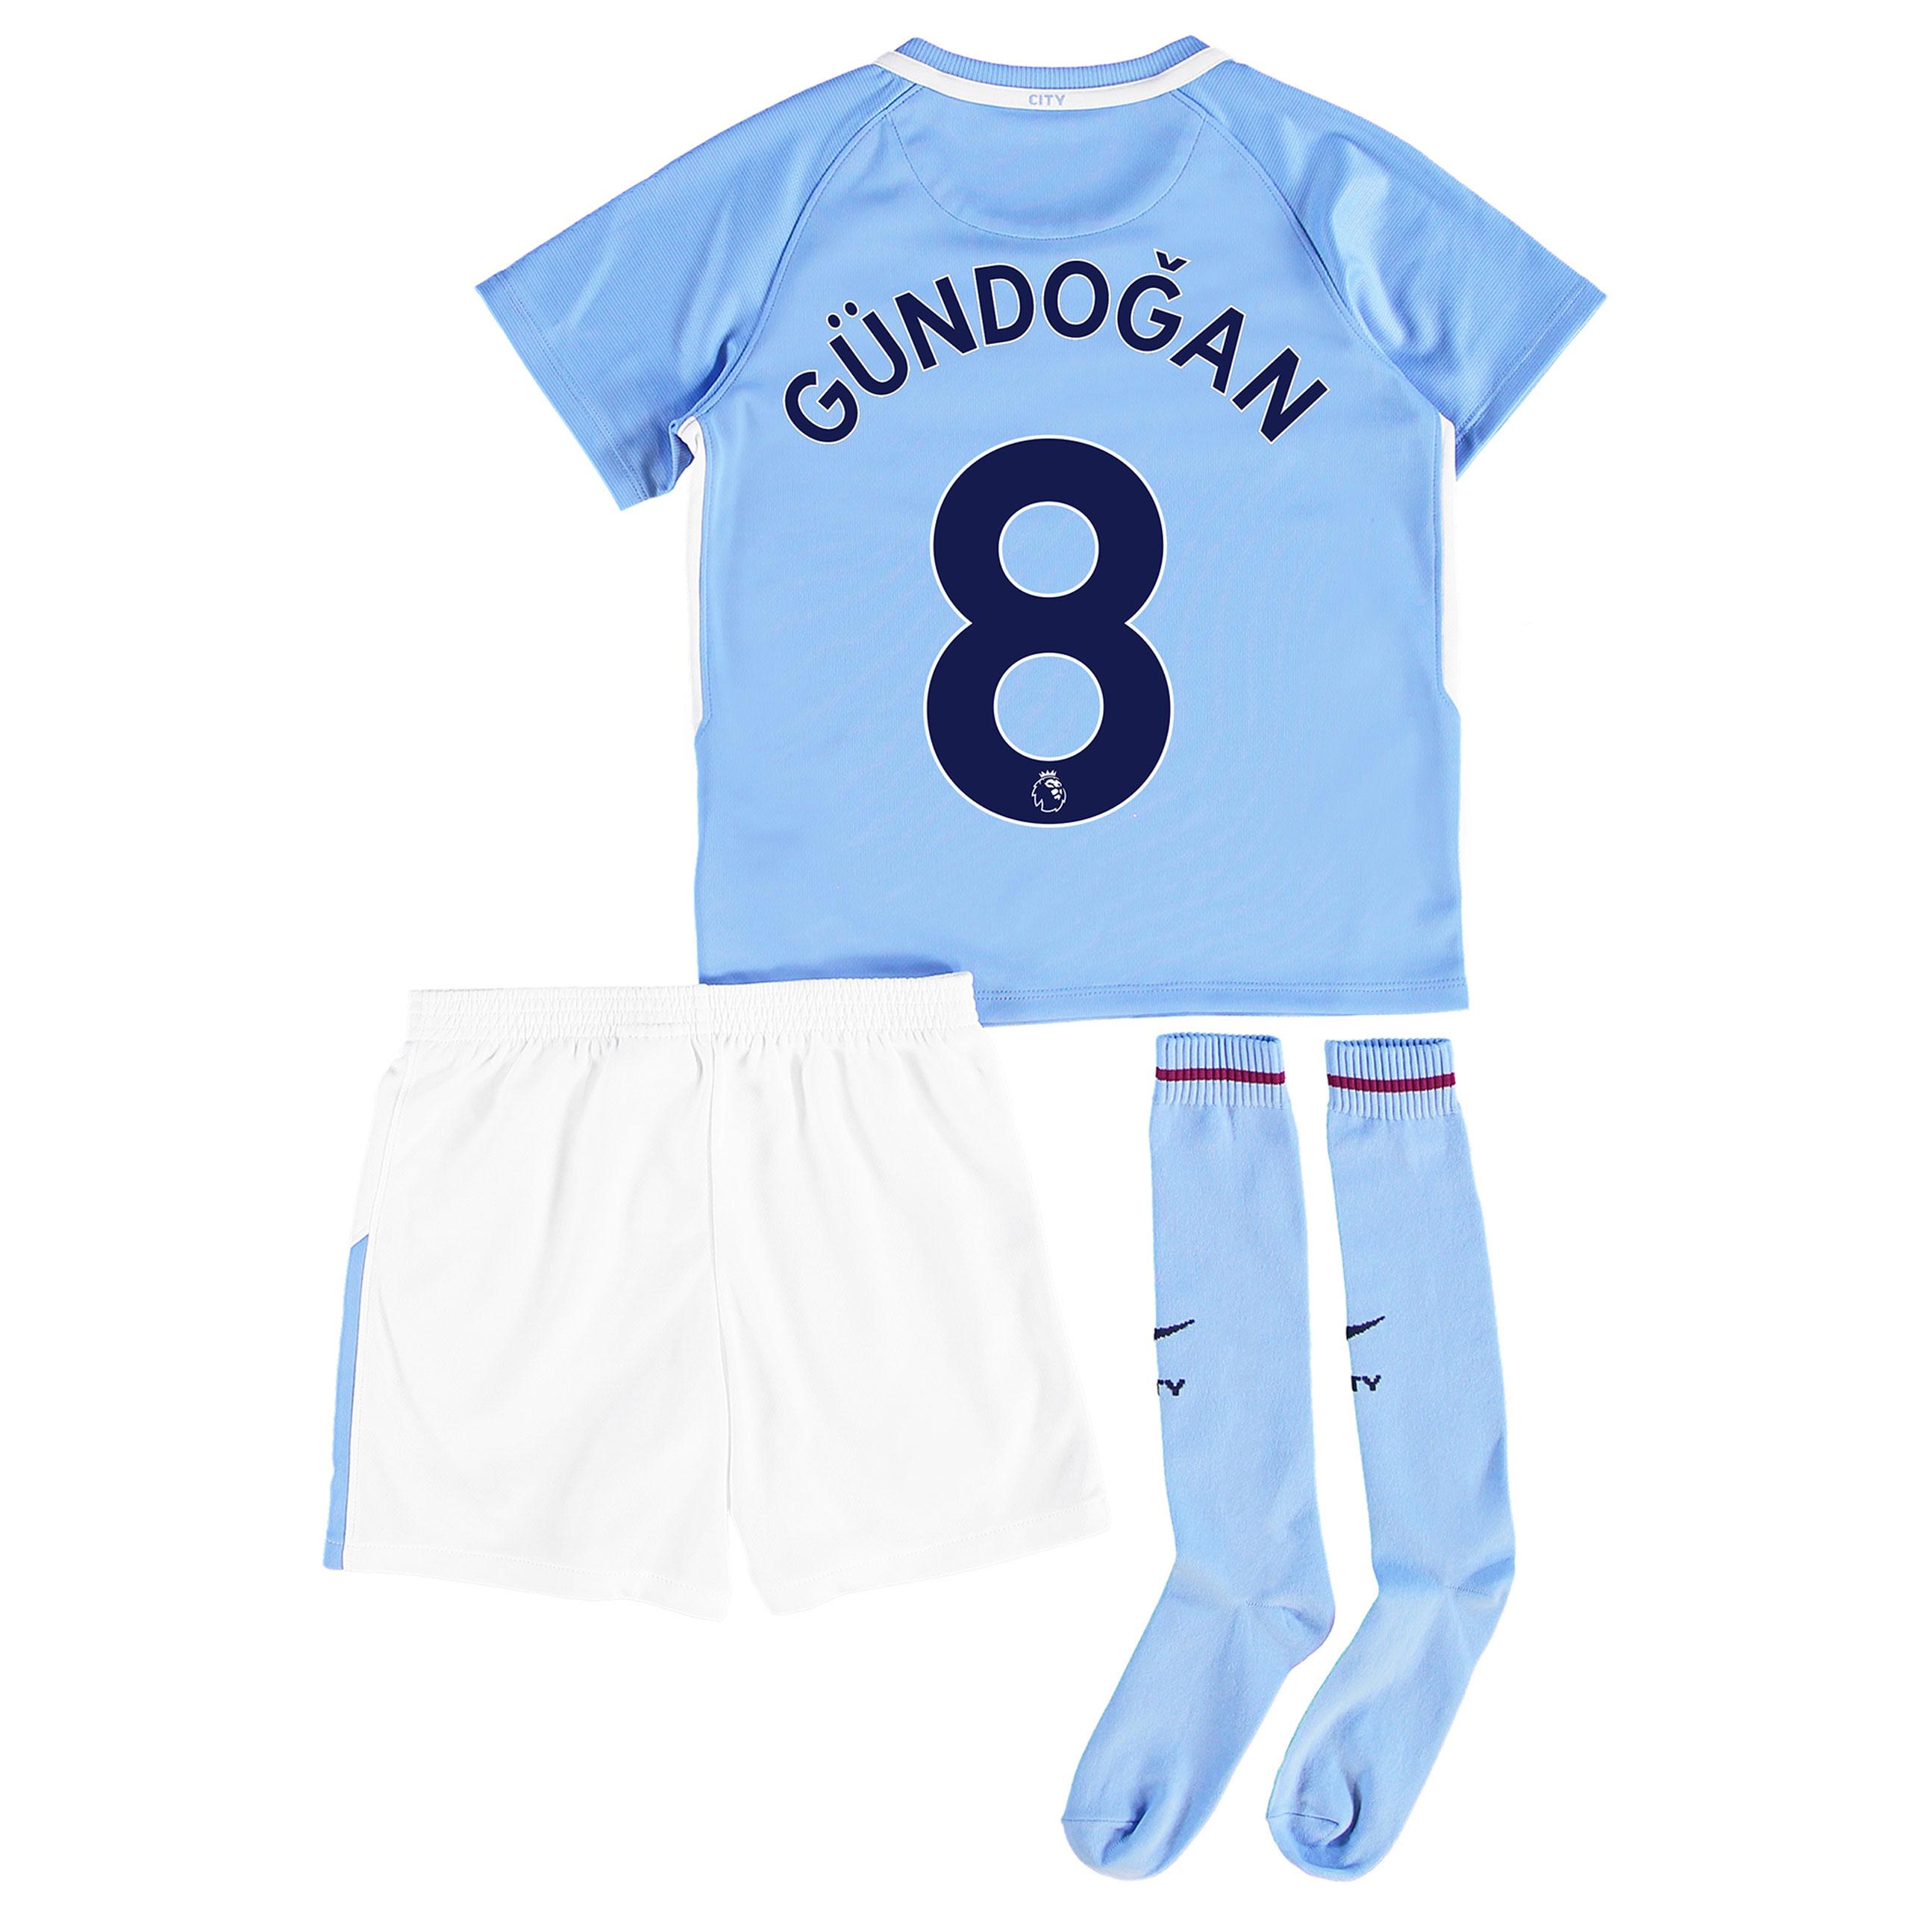 Manchester City Home Stadium Kit 2017-18 - Little Kids with G??ndogan 8